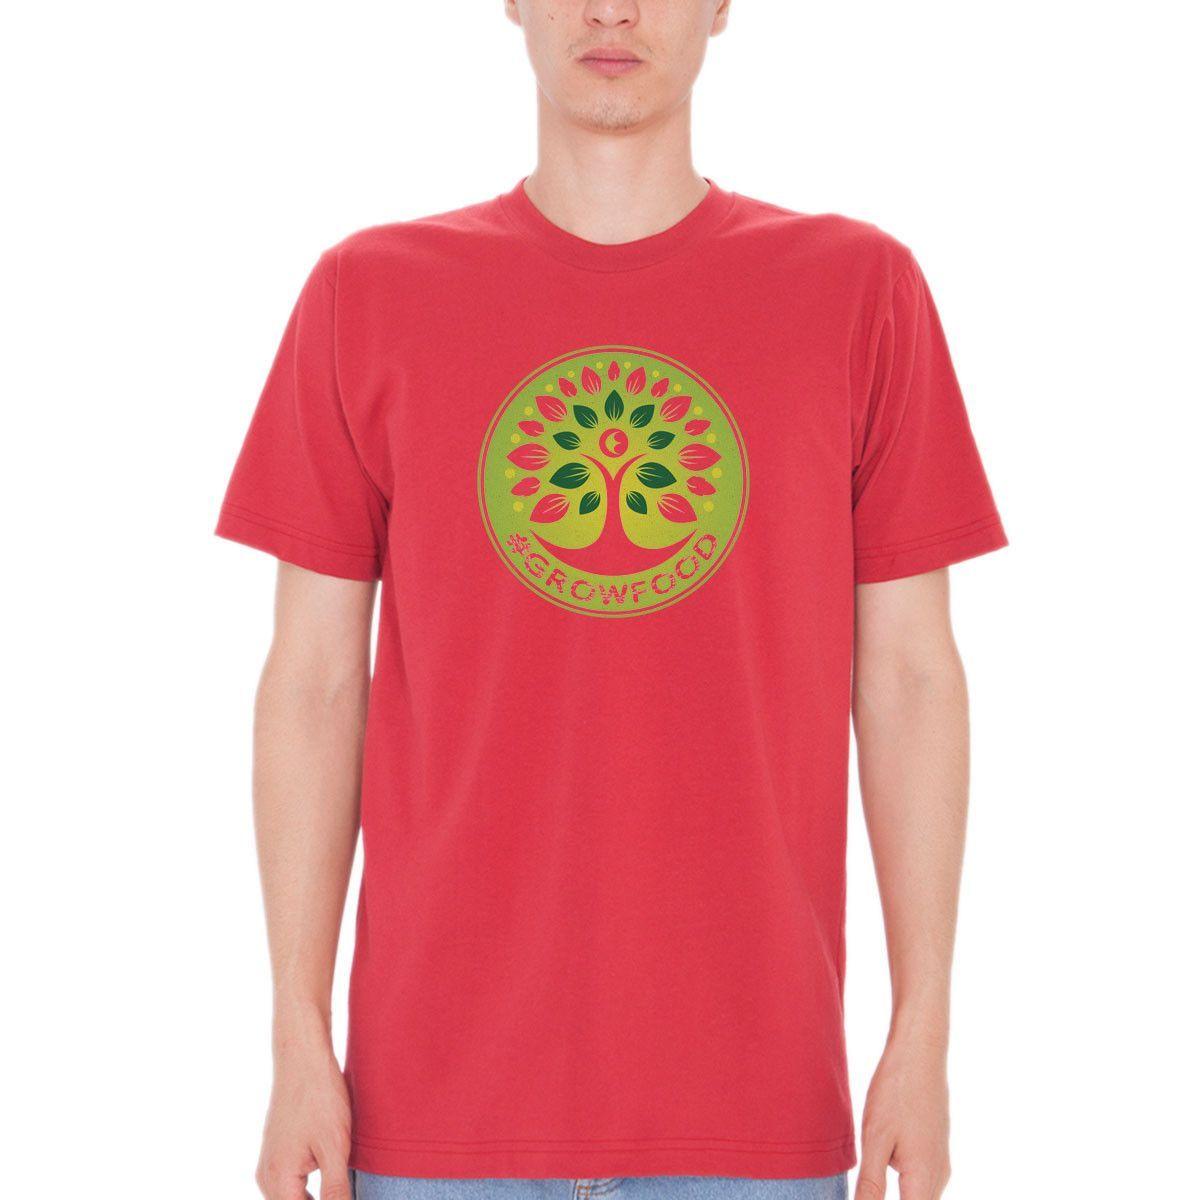 #GrowFood - Grow Life - Organic Cotton T-Shirt - Unisex